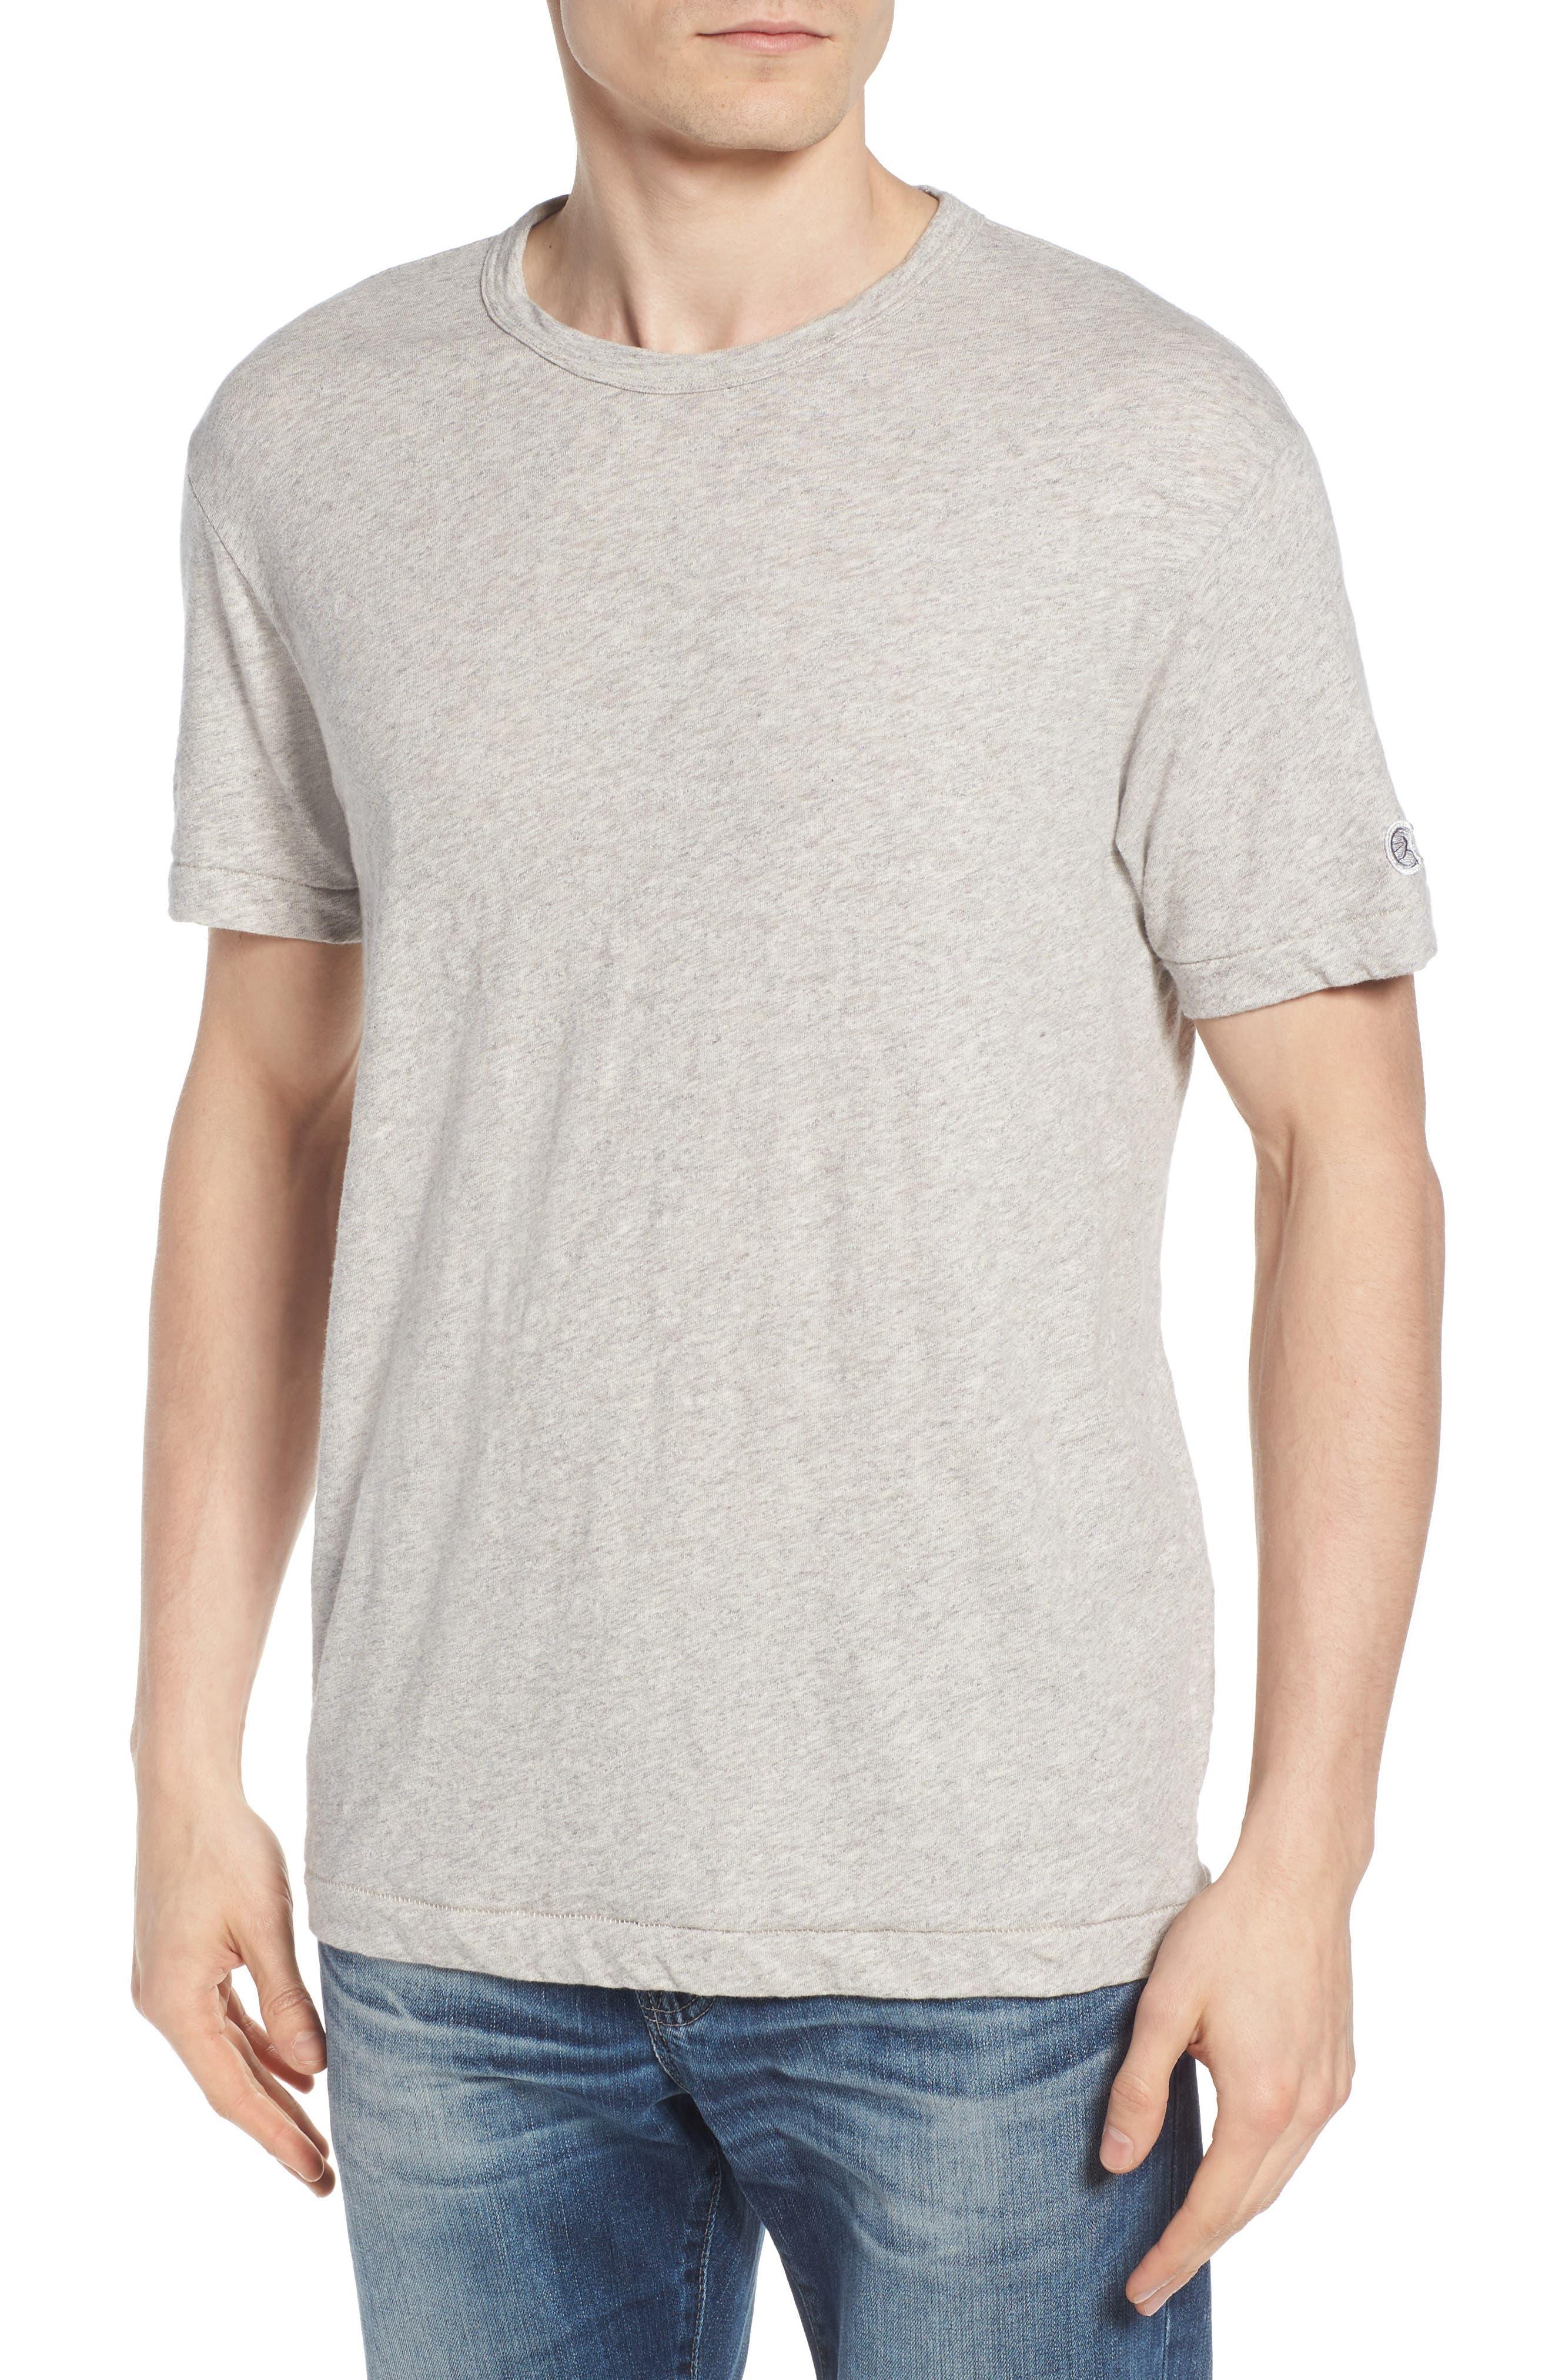 + Champion Heathered Crewneck T-Shirt,                             Main thumbnail 1, color,                             Antique Grey Mix